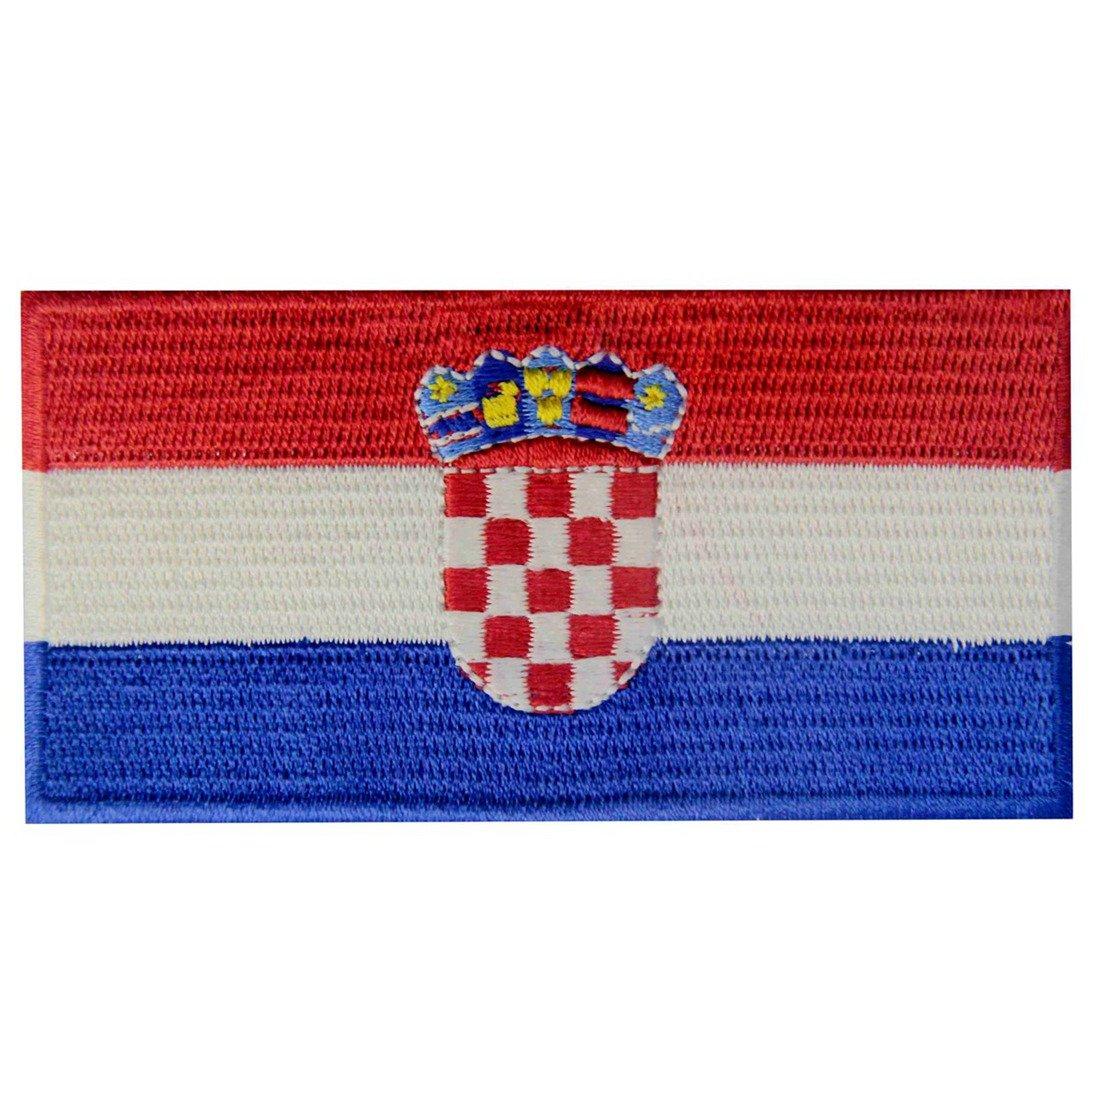 Kroatien Flagge Bestickter kroatisch Aufnäher zum Aufbügeln/Annähen